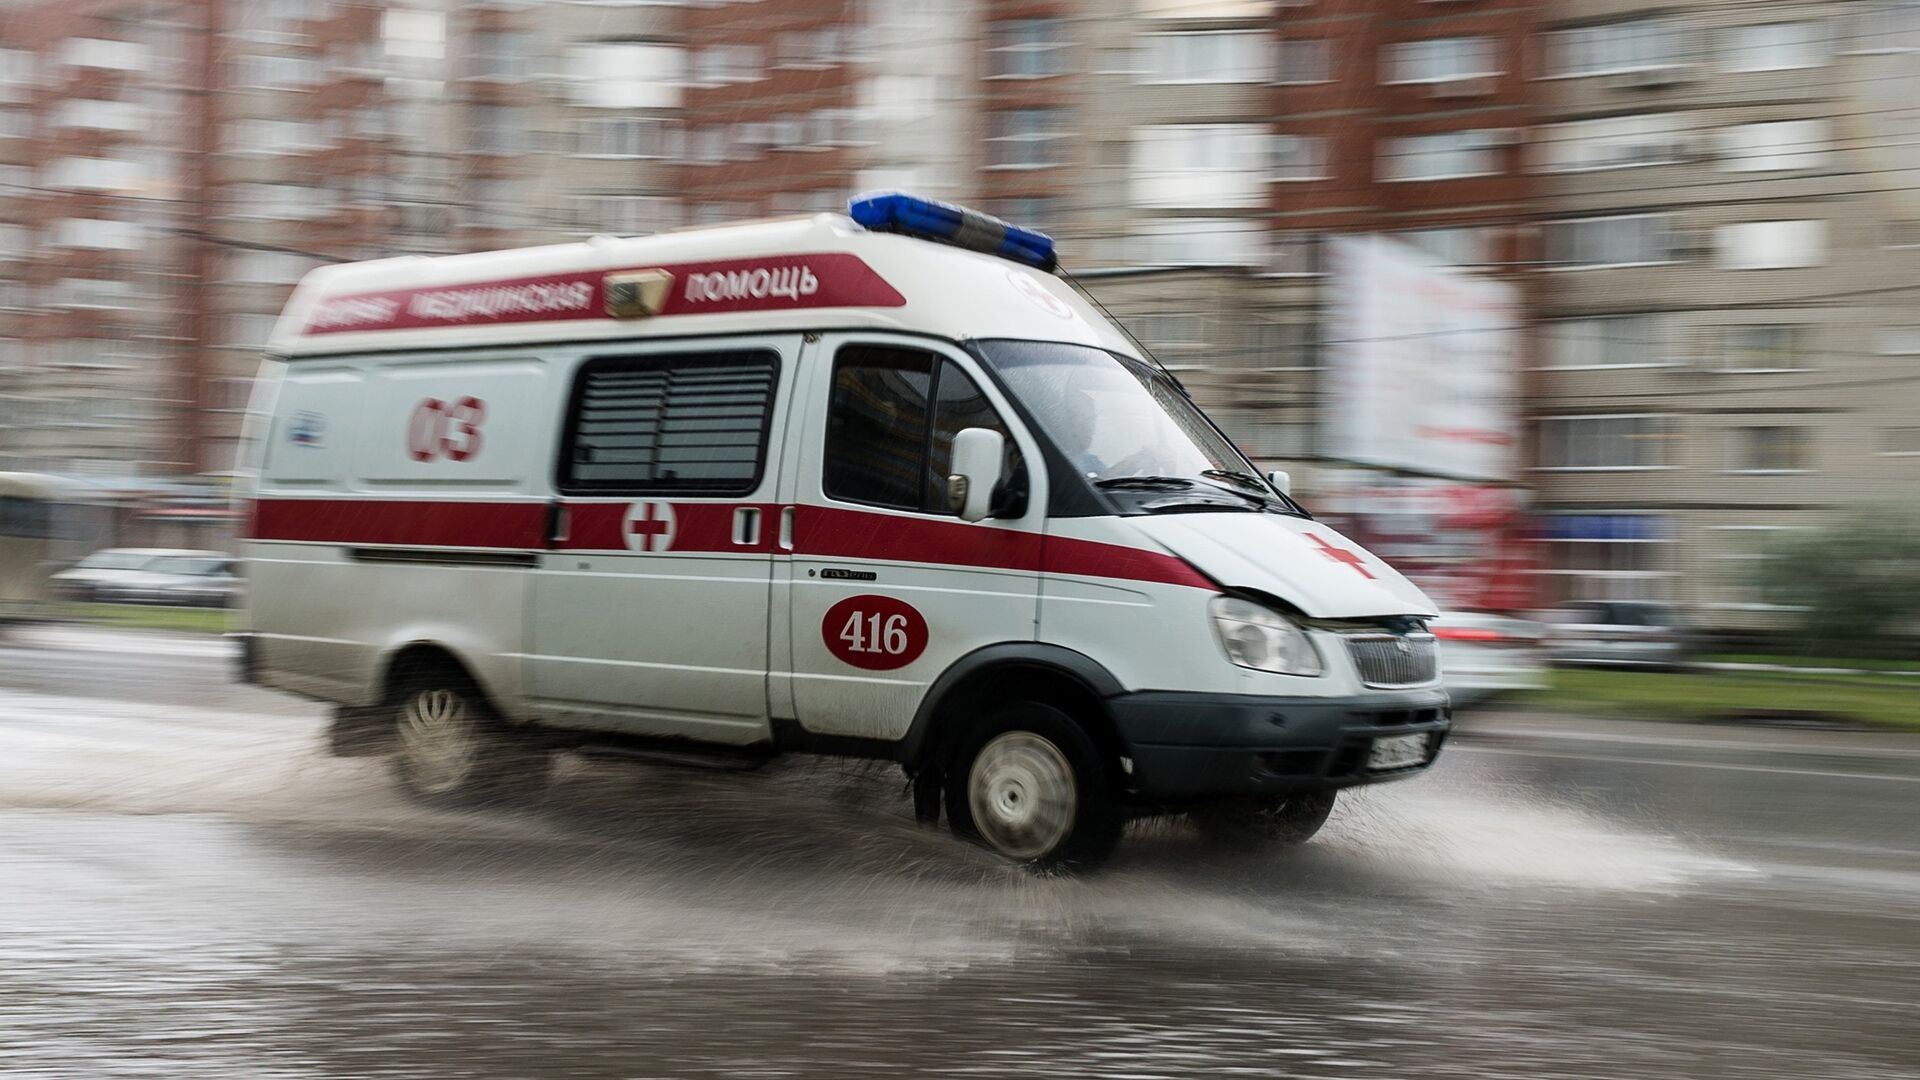 La ambulancia rusa - Sputnik Mundo, 1920, 08.09.2021